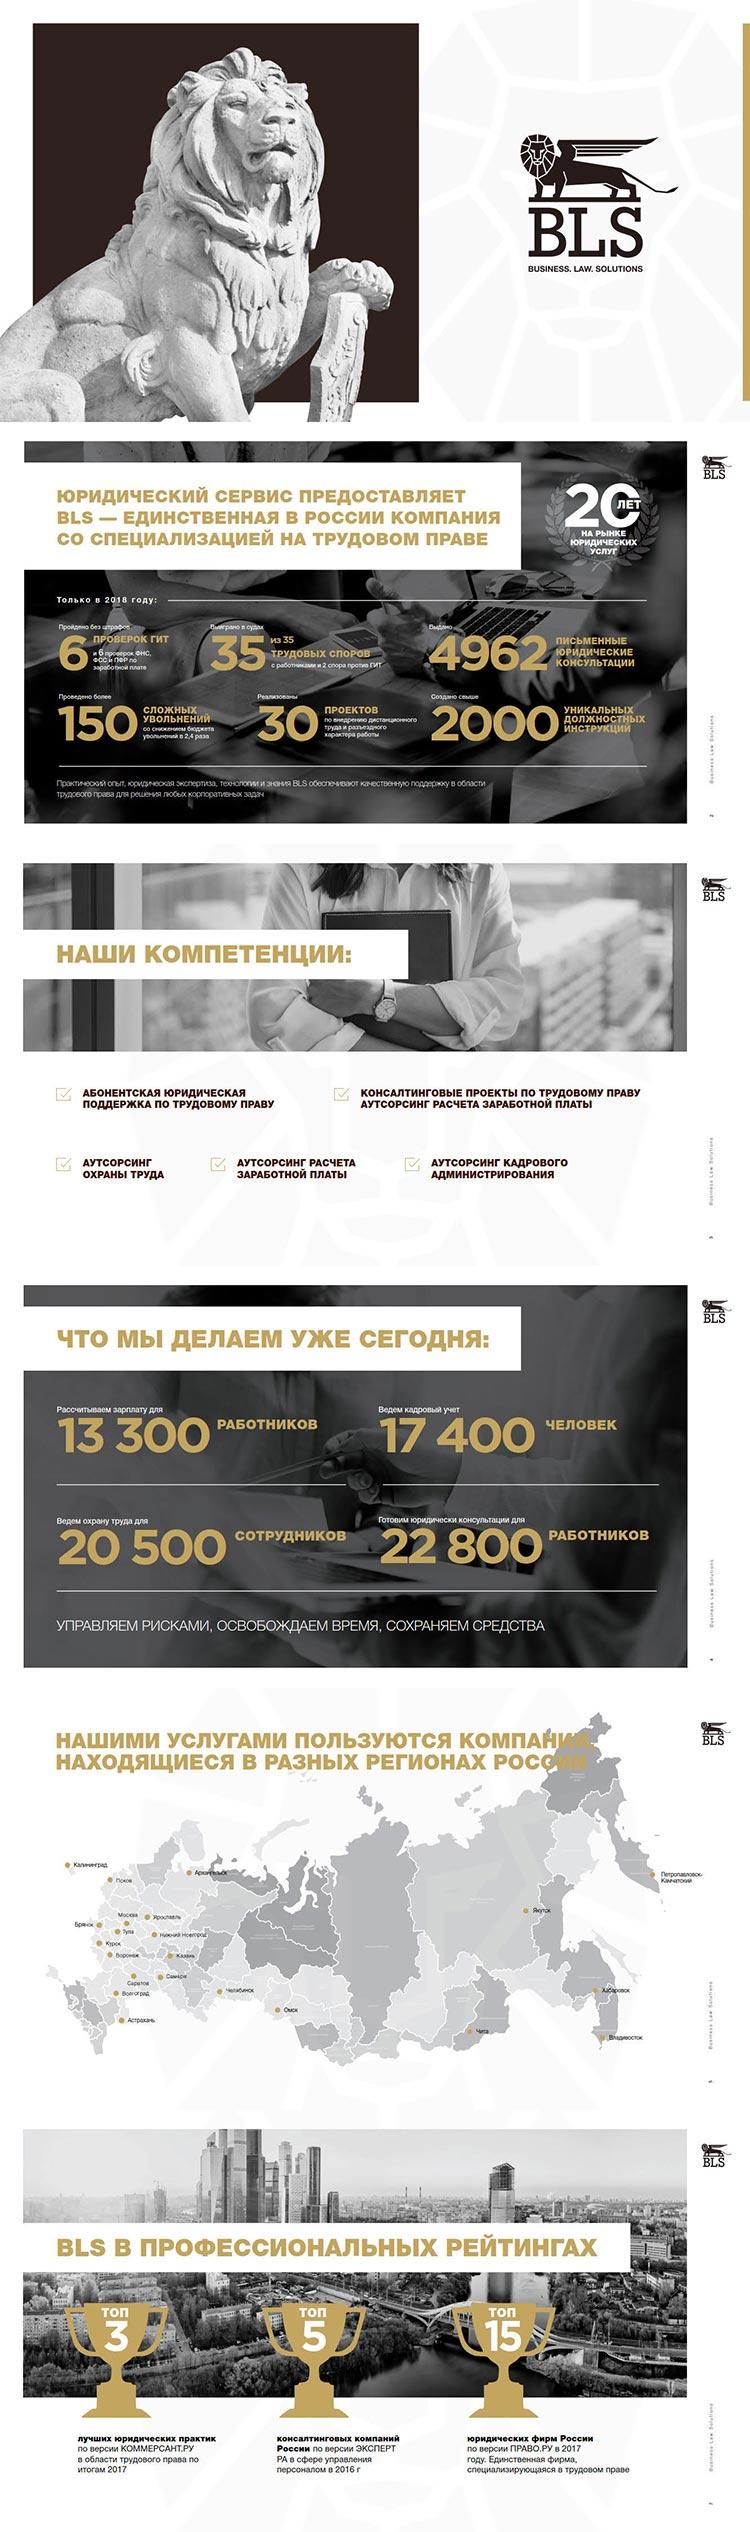 zakazat-Prezentacija-juridicheskoj-kompanii-dlja-klientov